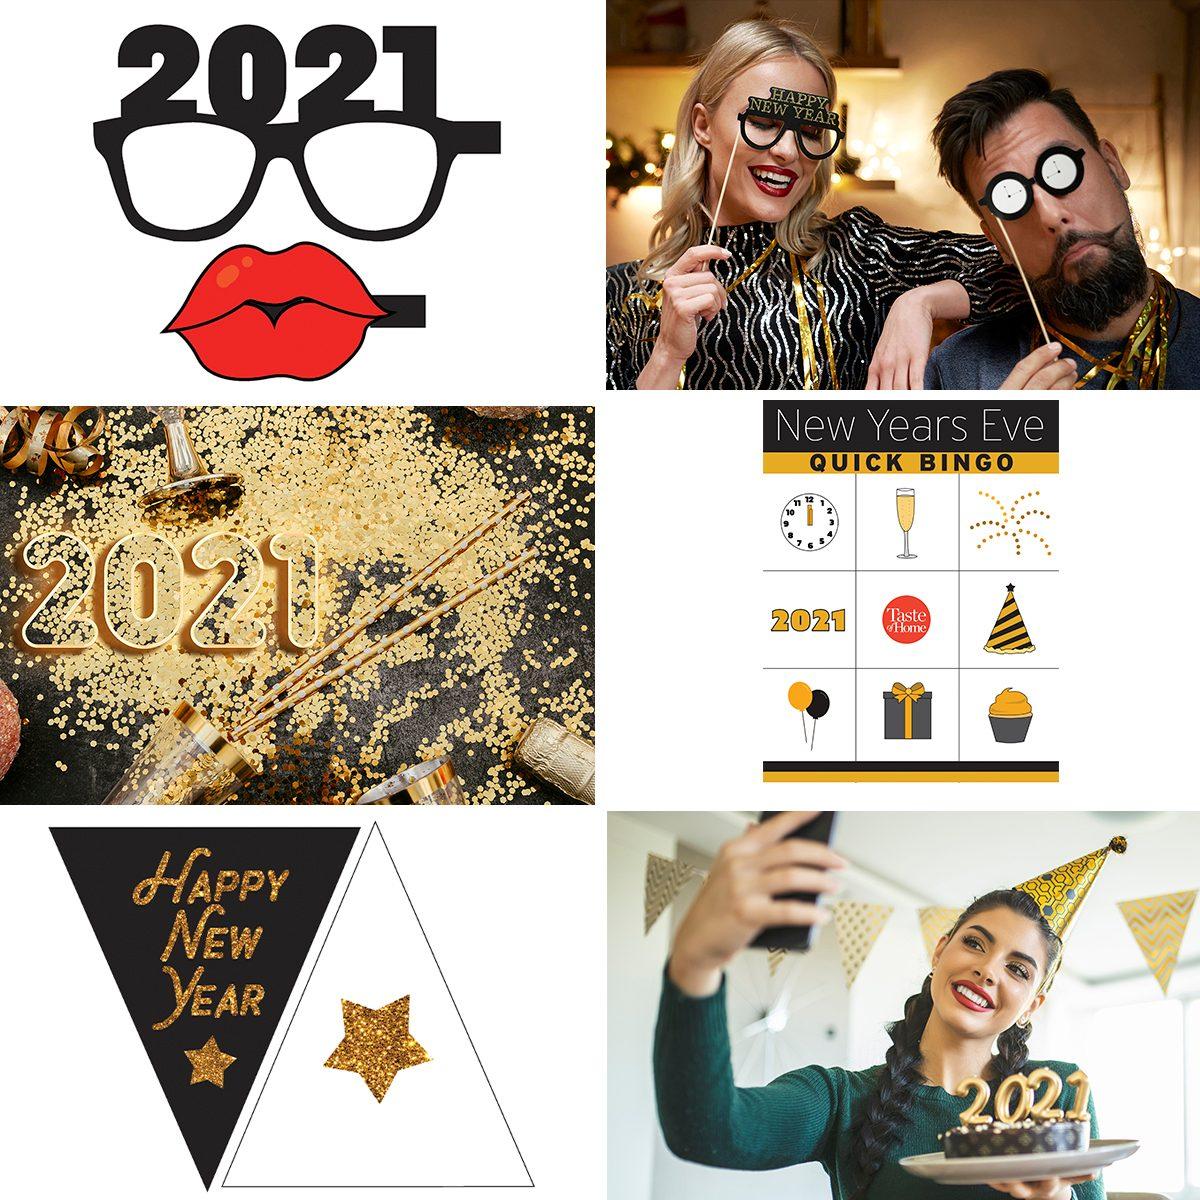 New Years cutouts